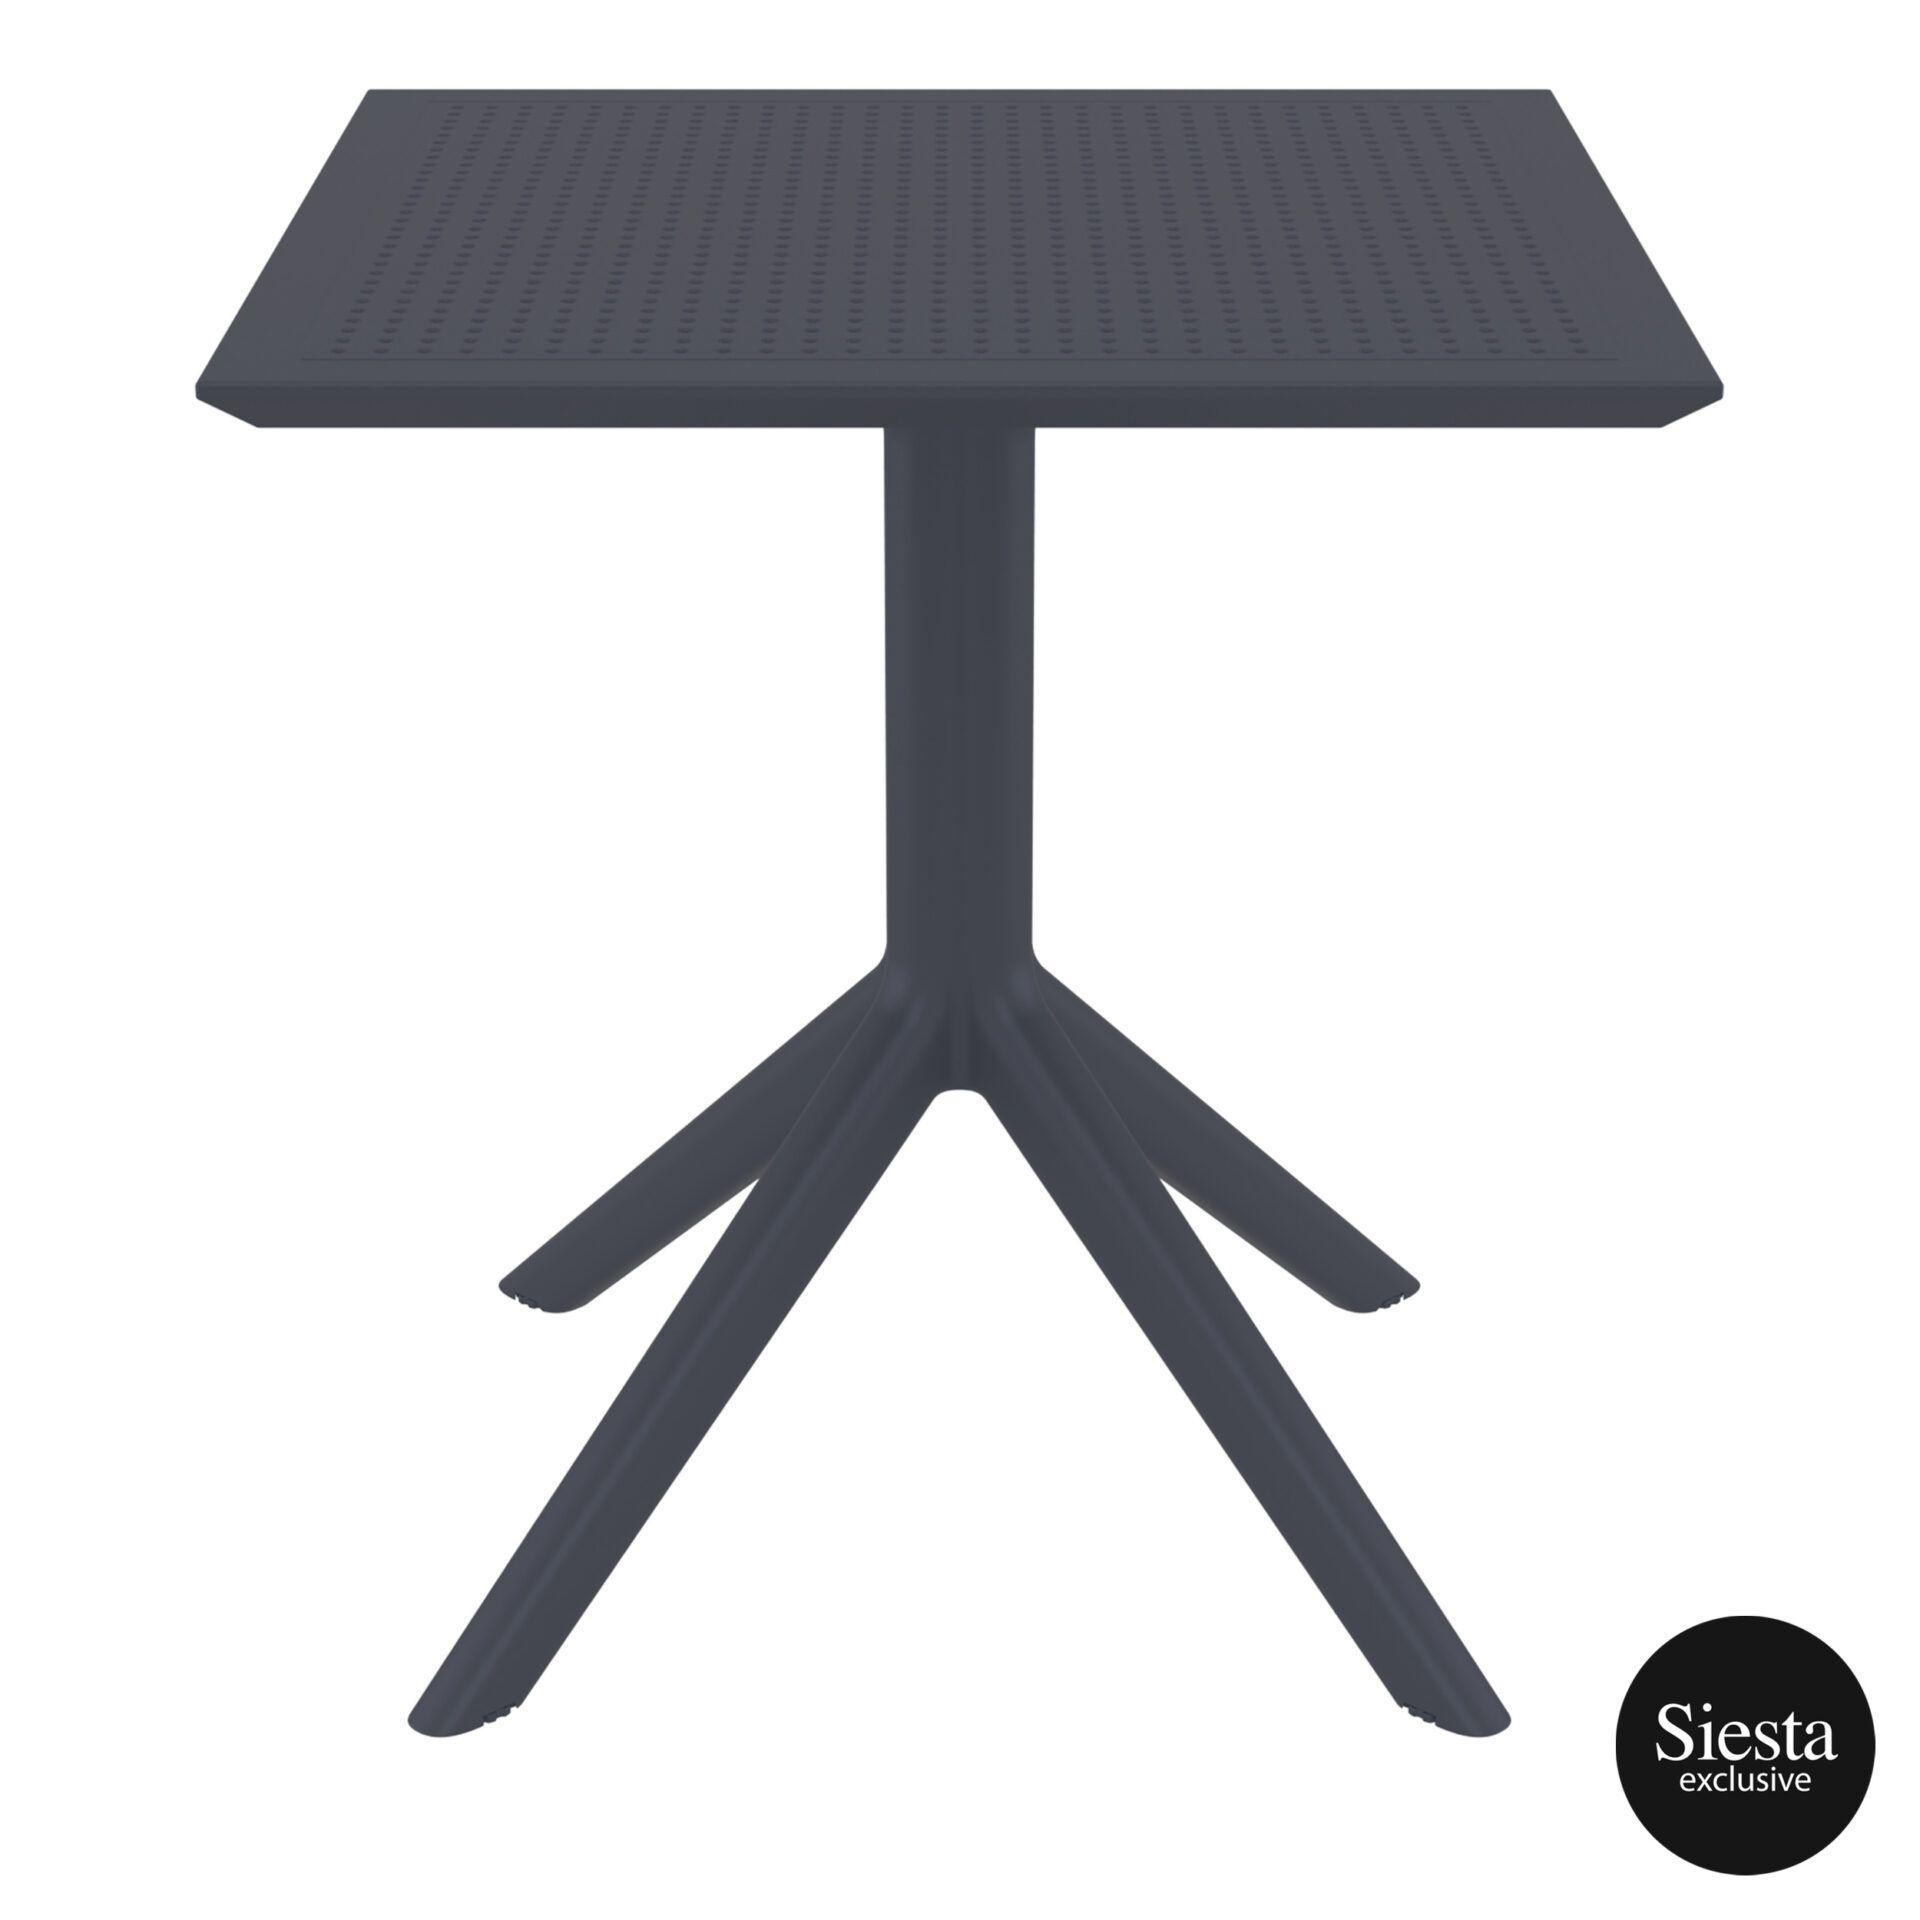 polypropylene outdoor cafe sky table 70 darkgrey front 2